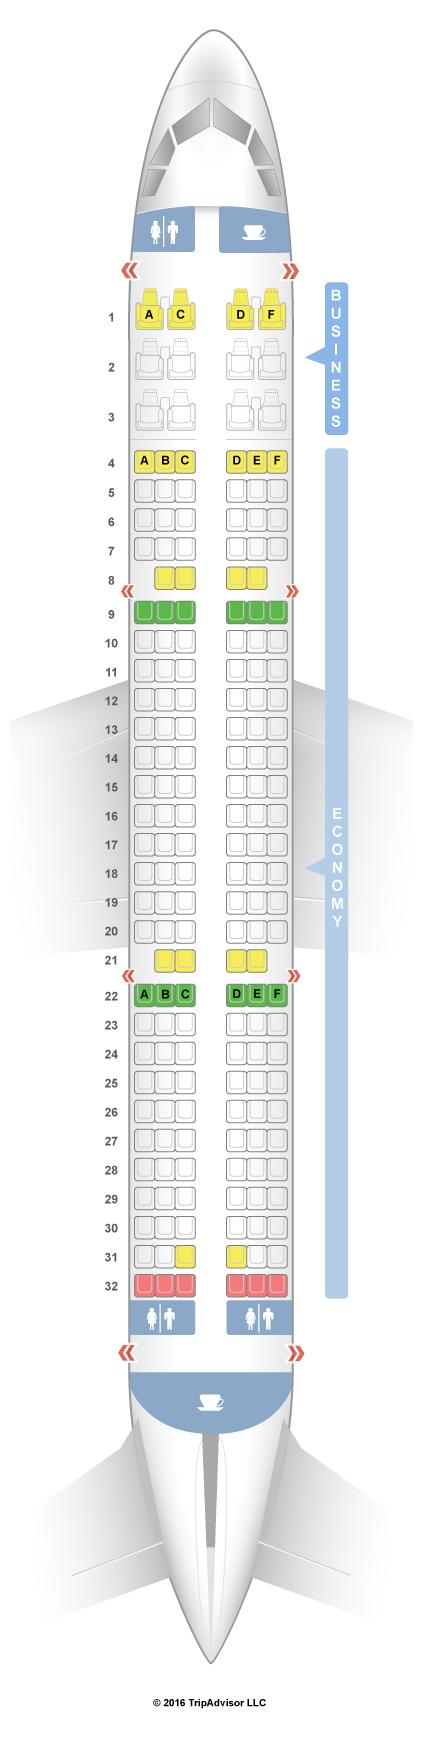 SeatGuru Seat Map Air India Airbus A321 (321)